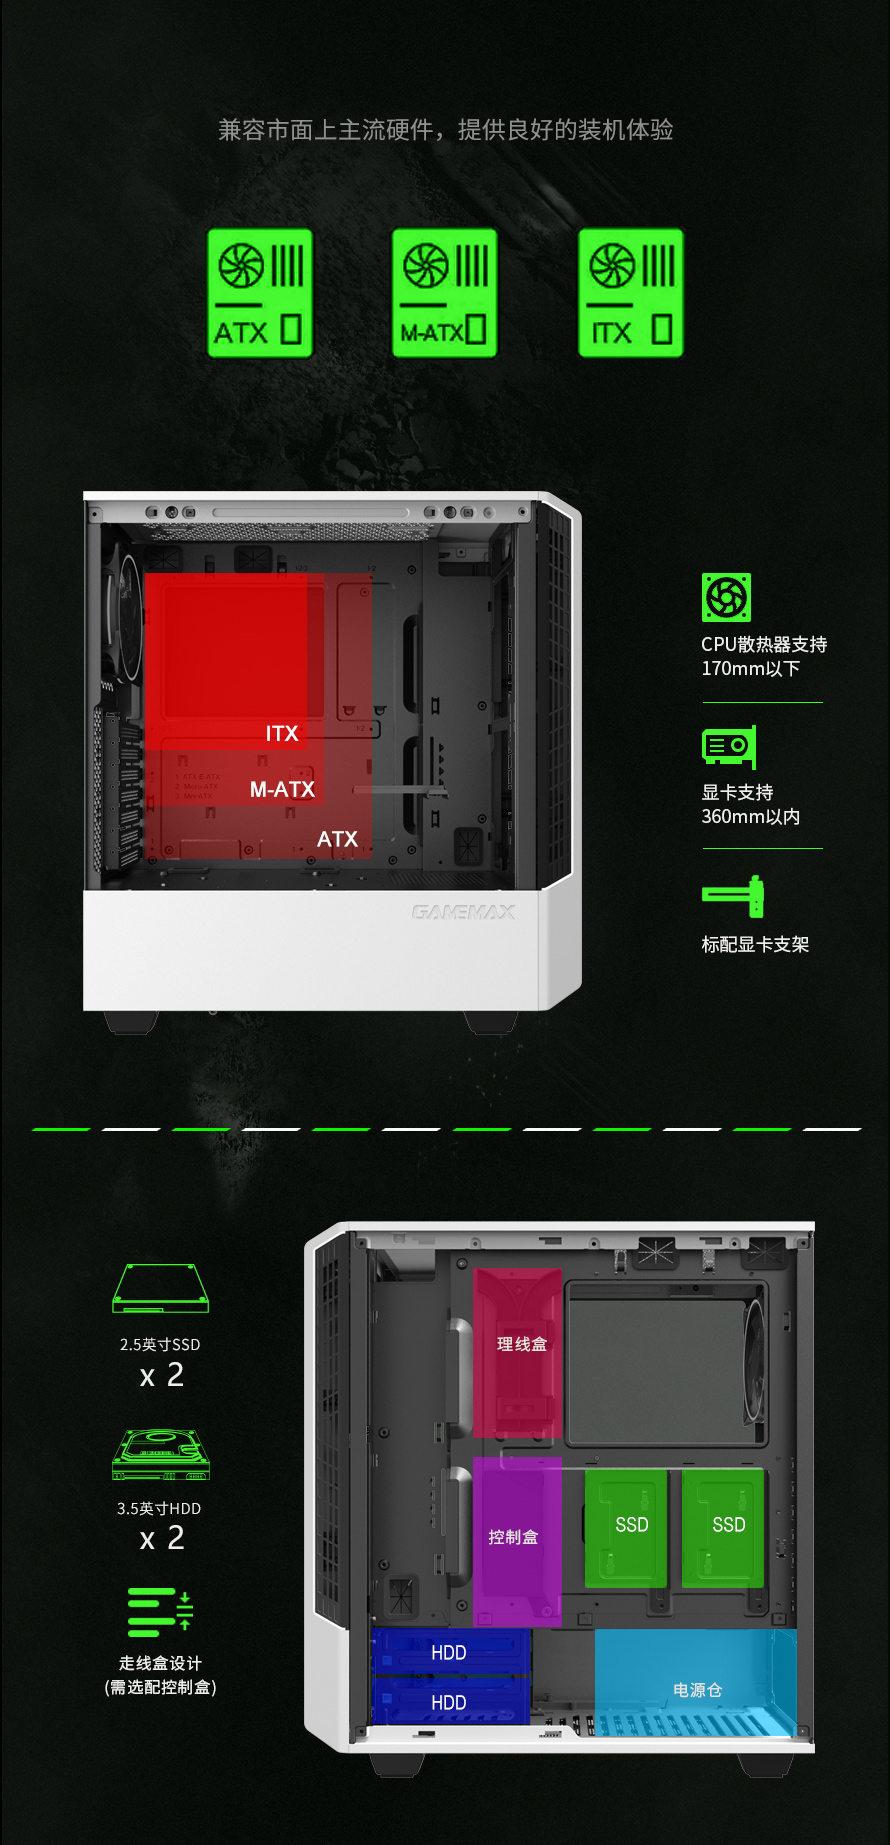 T802_Panda详情页中文_看图王2_03.jpg